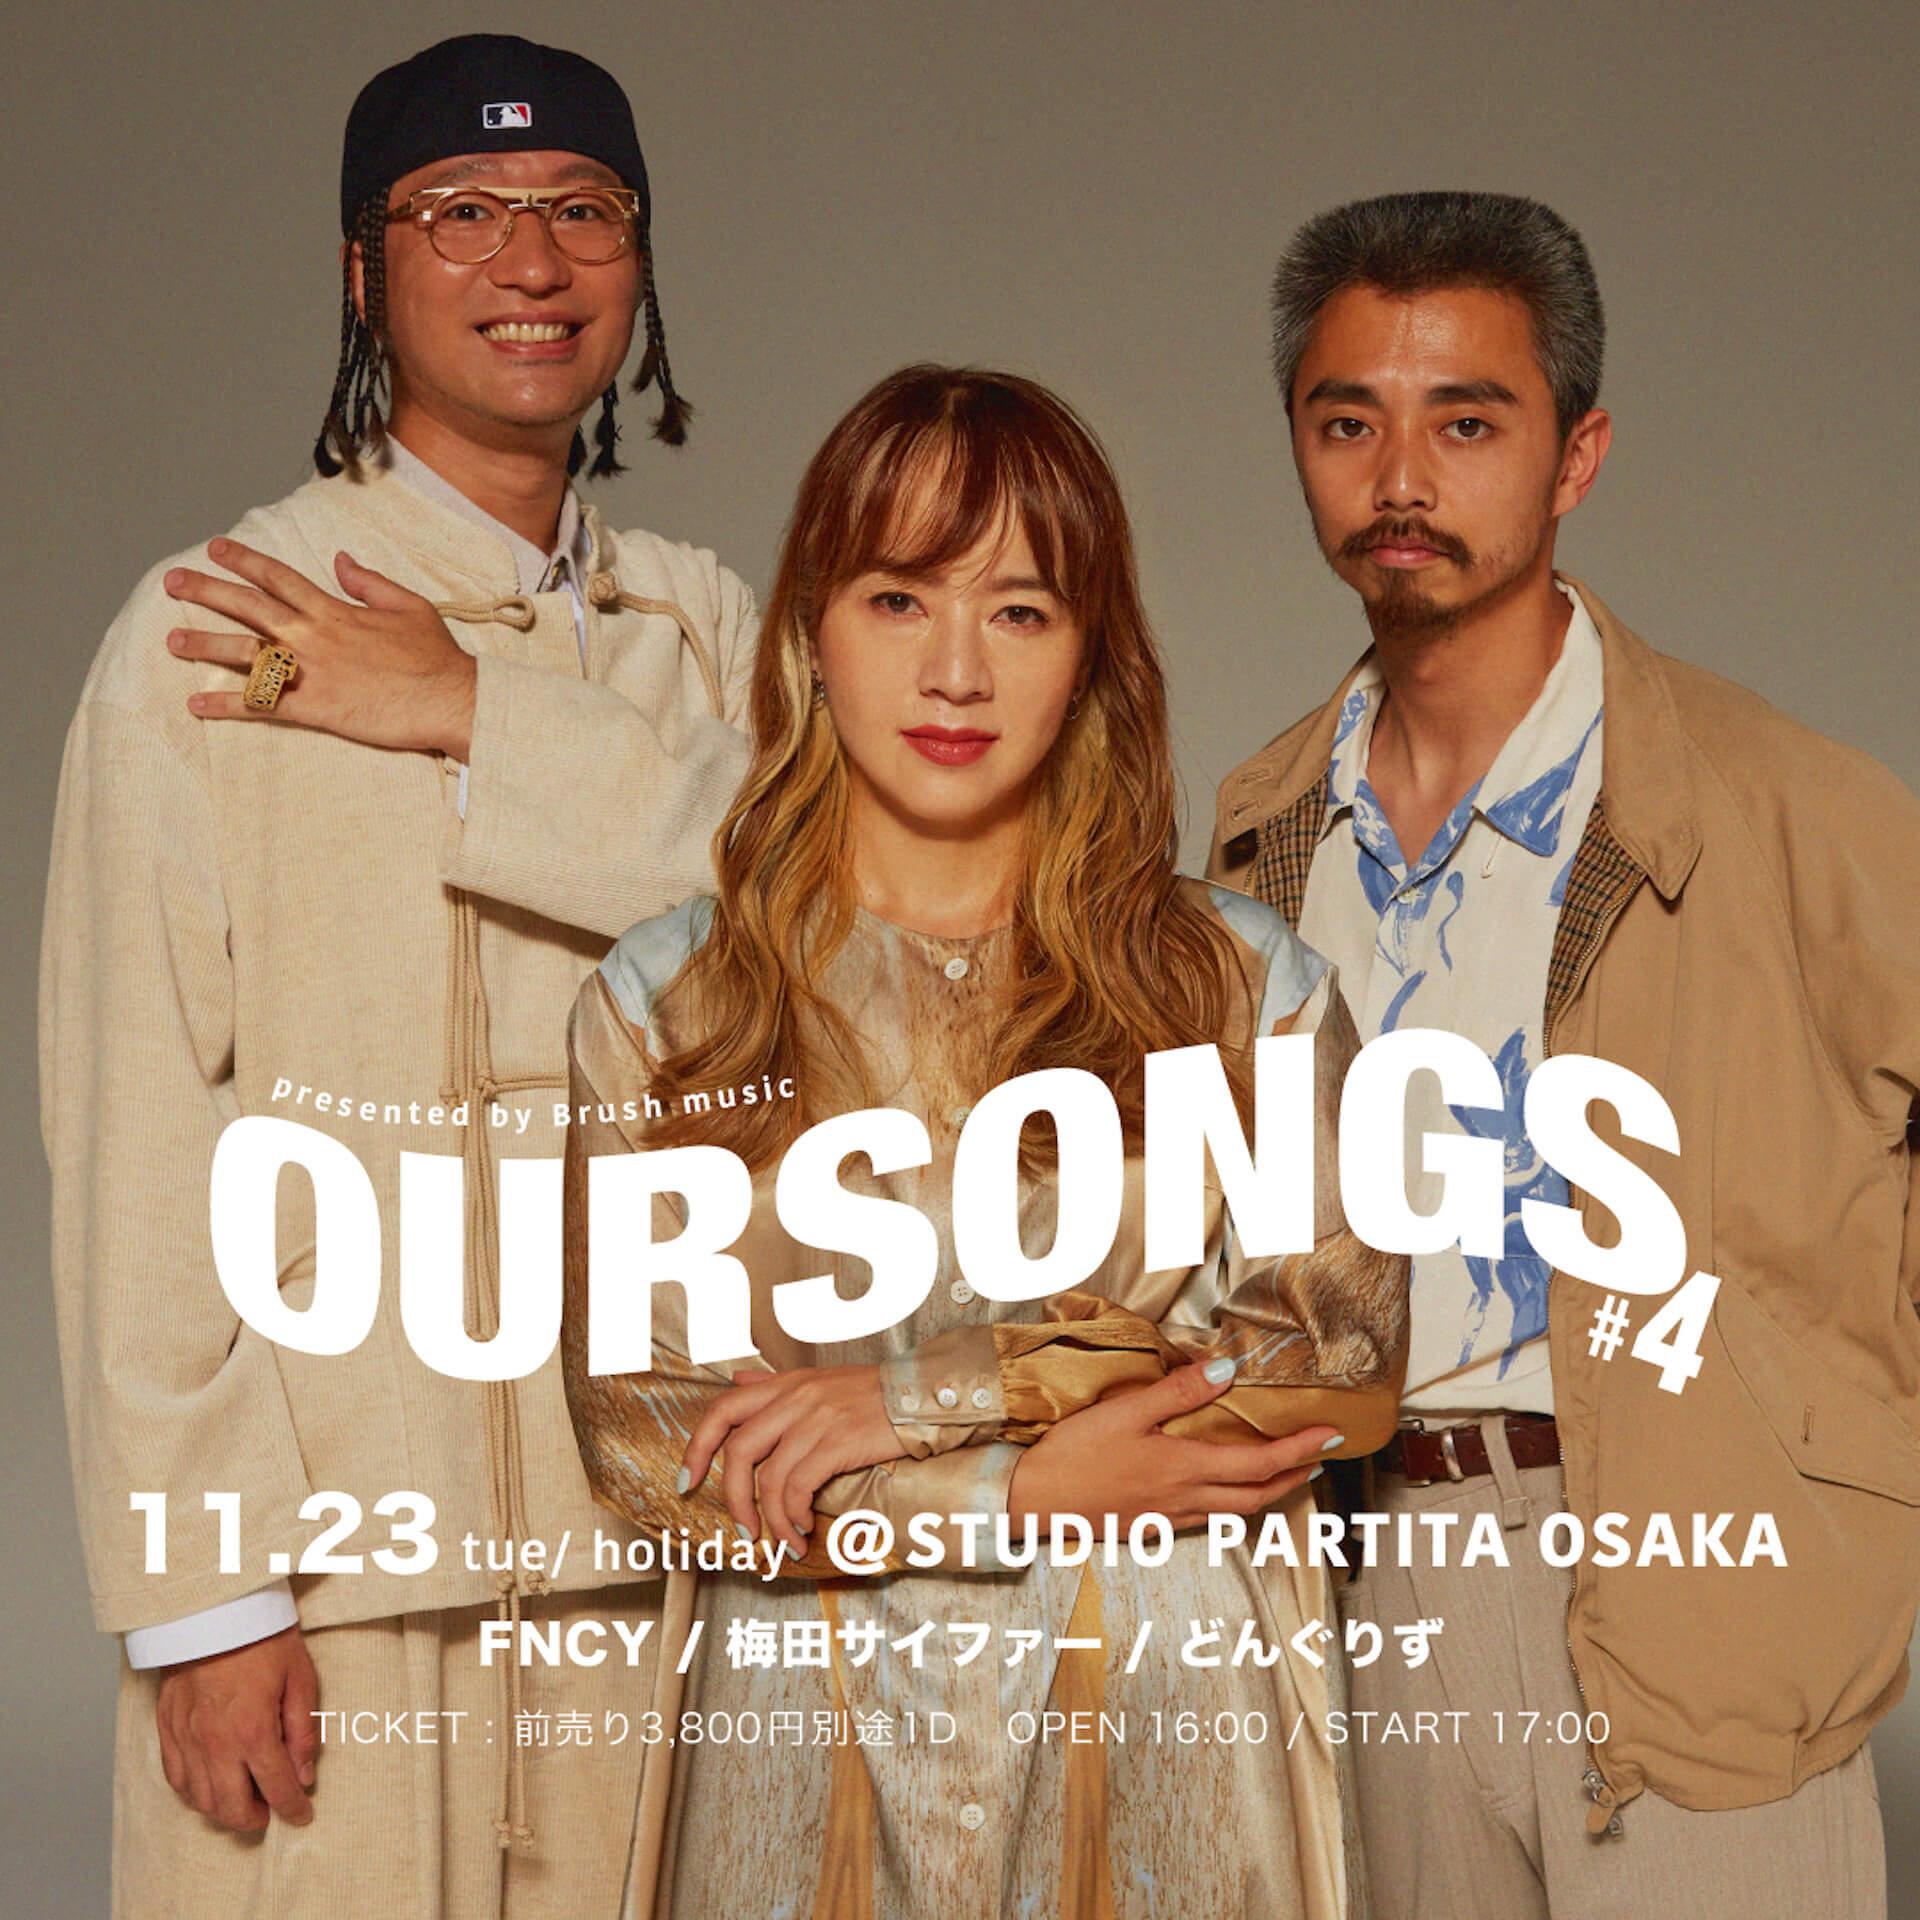 <OURSONGS #4>が大阪名村造船所跡地にて開催が決定!梅田サイファー、FNCY、どんぐりずによるスリーマン music211012_oursongs_04